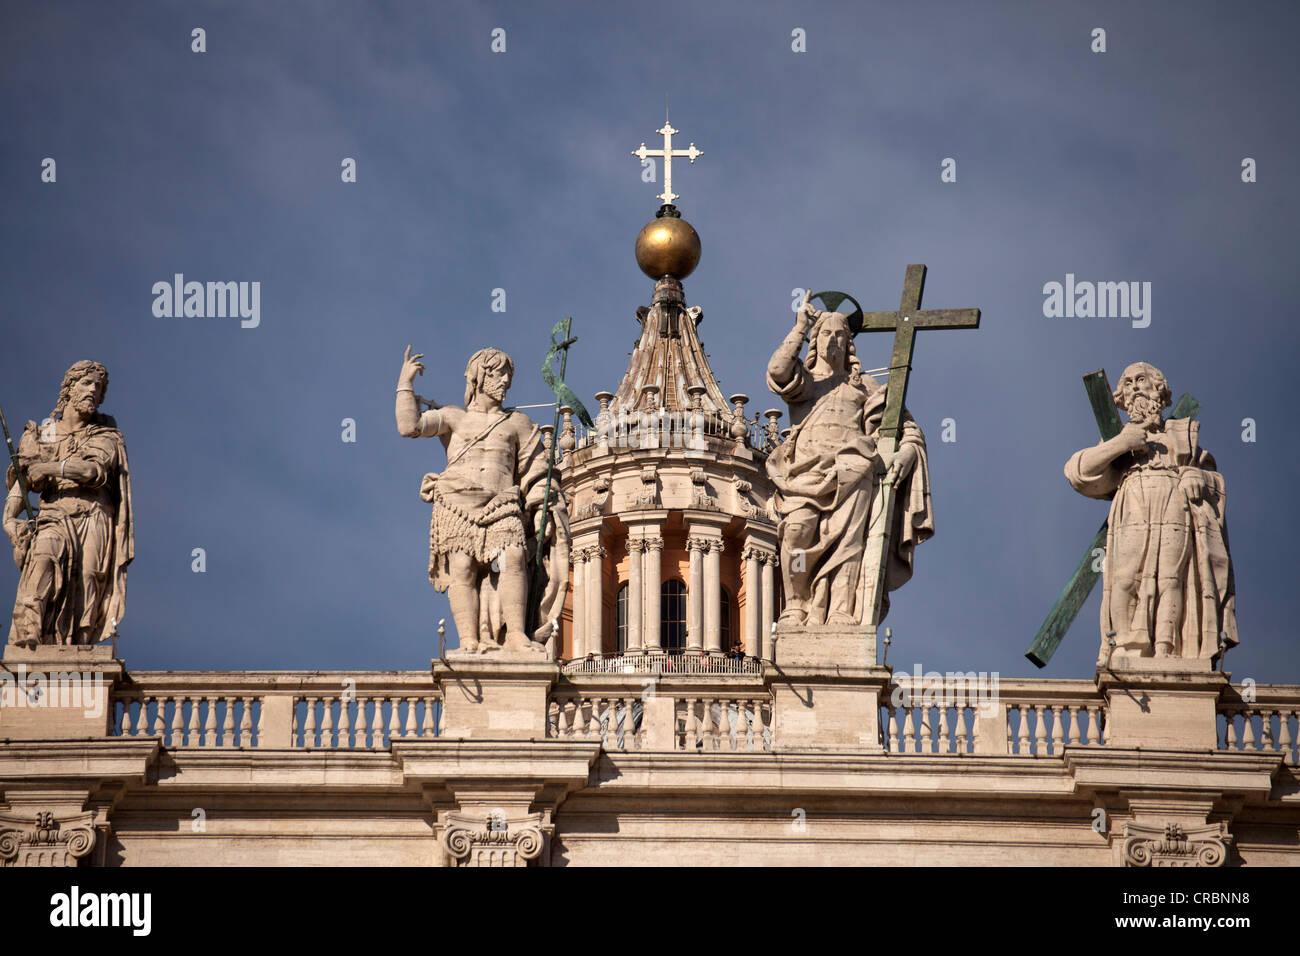 St Peters Basilica Cross